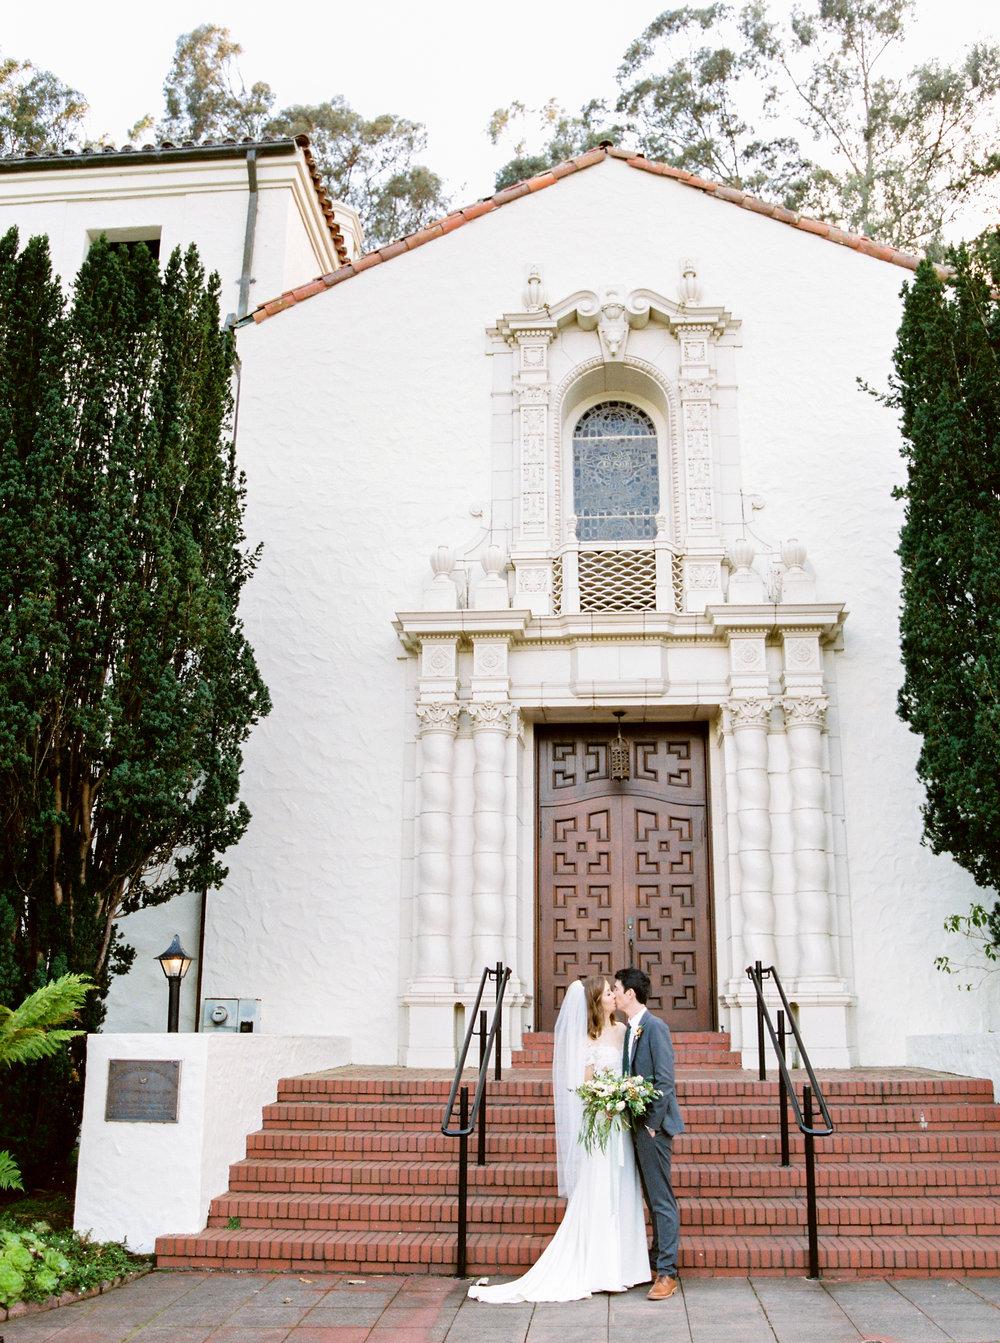 Log-cabin-wedding-in-presidio-san-francisco-california-desintation-wedding-photography-121.jpg